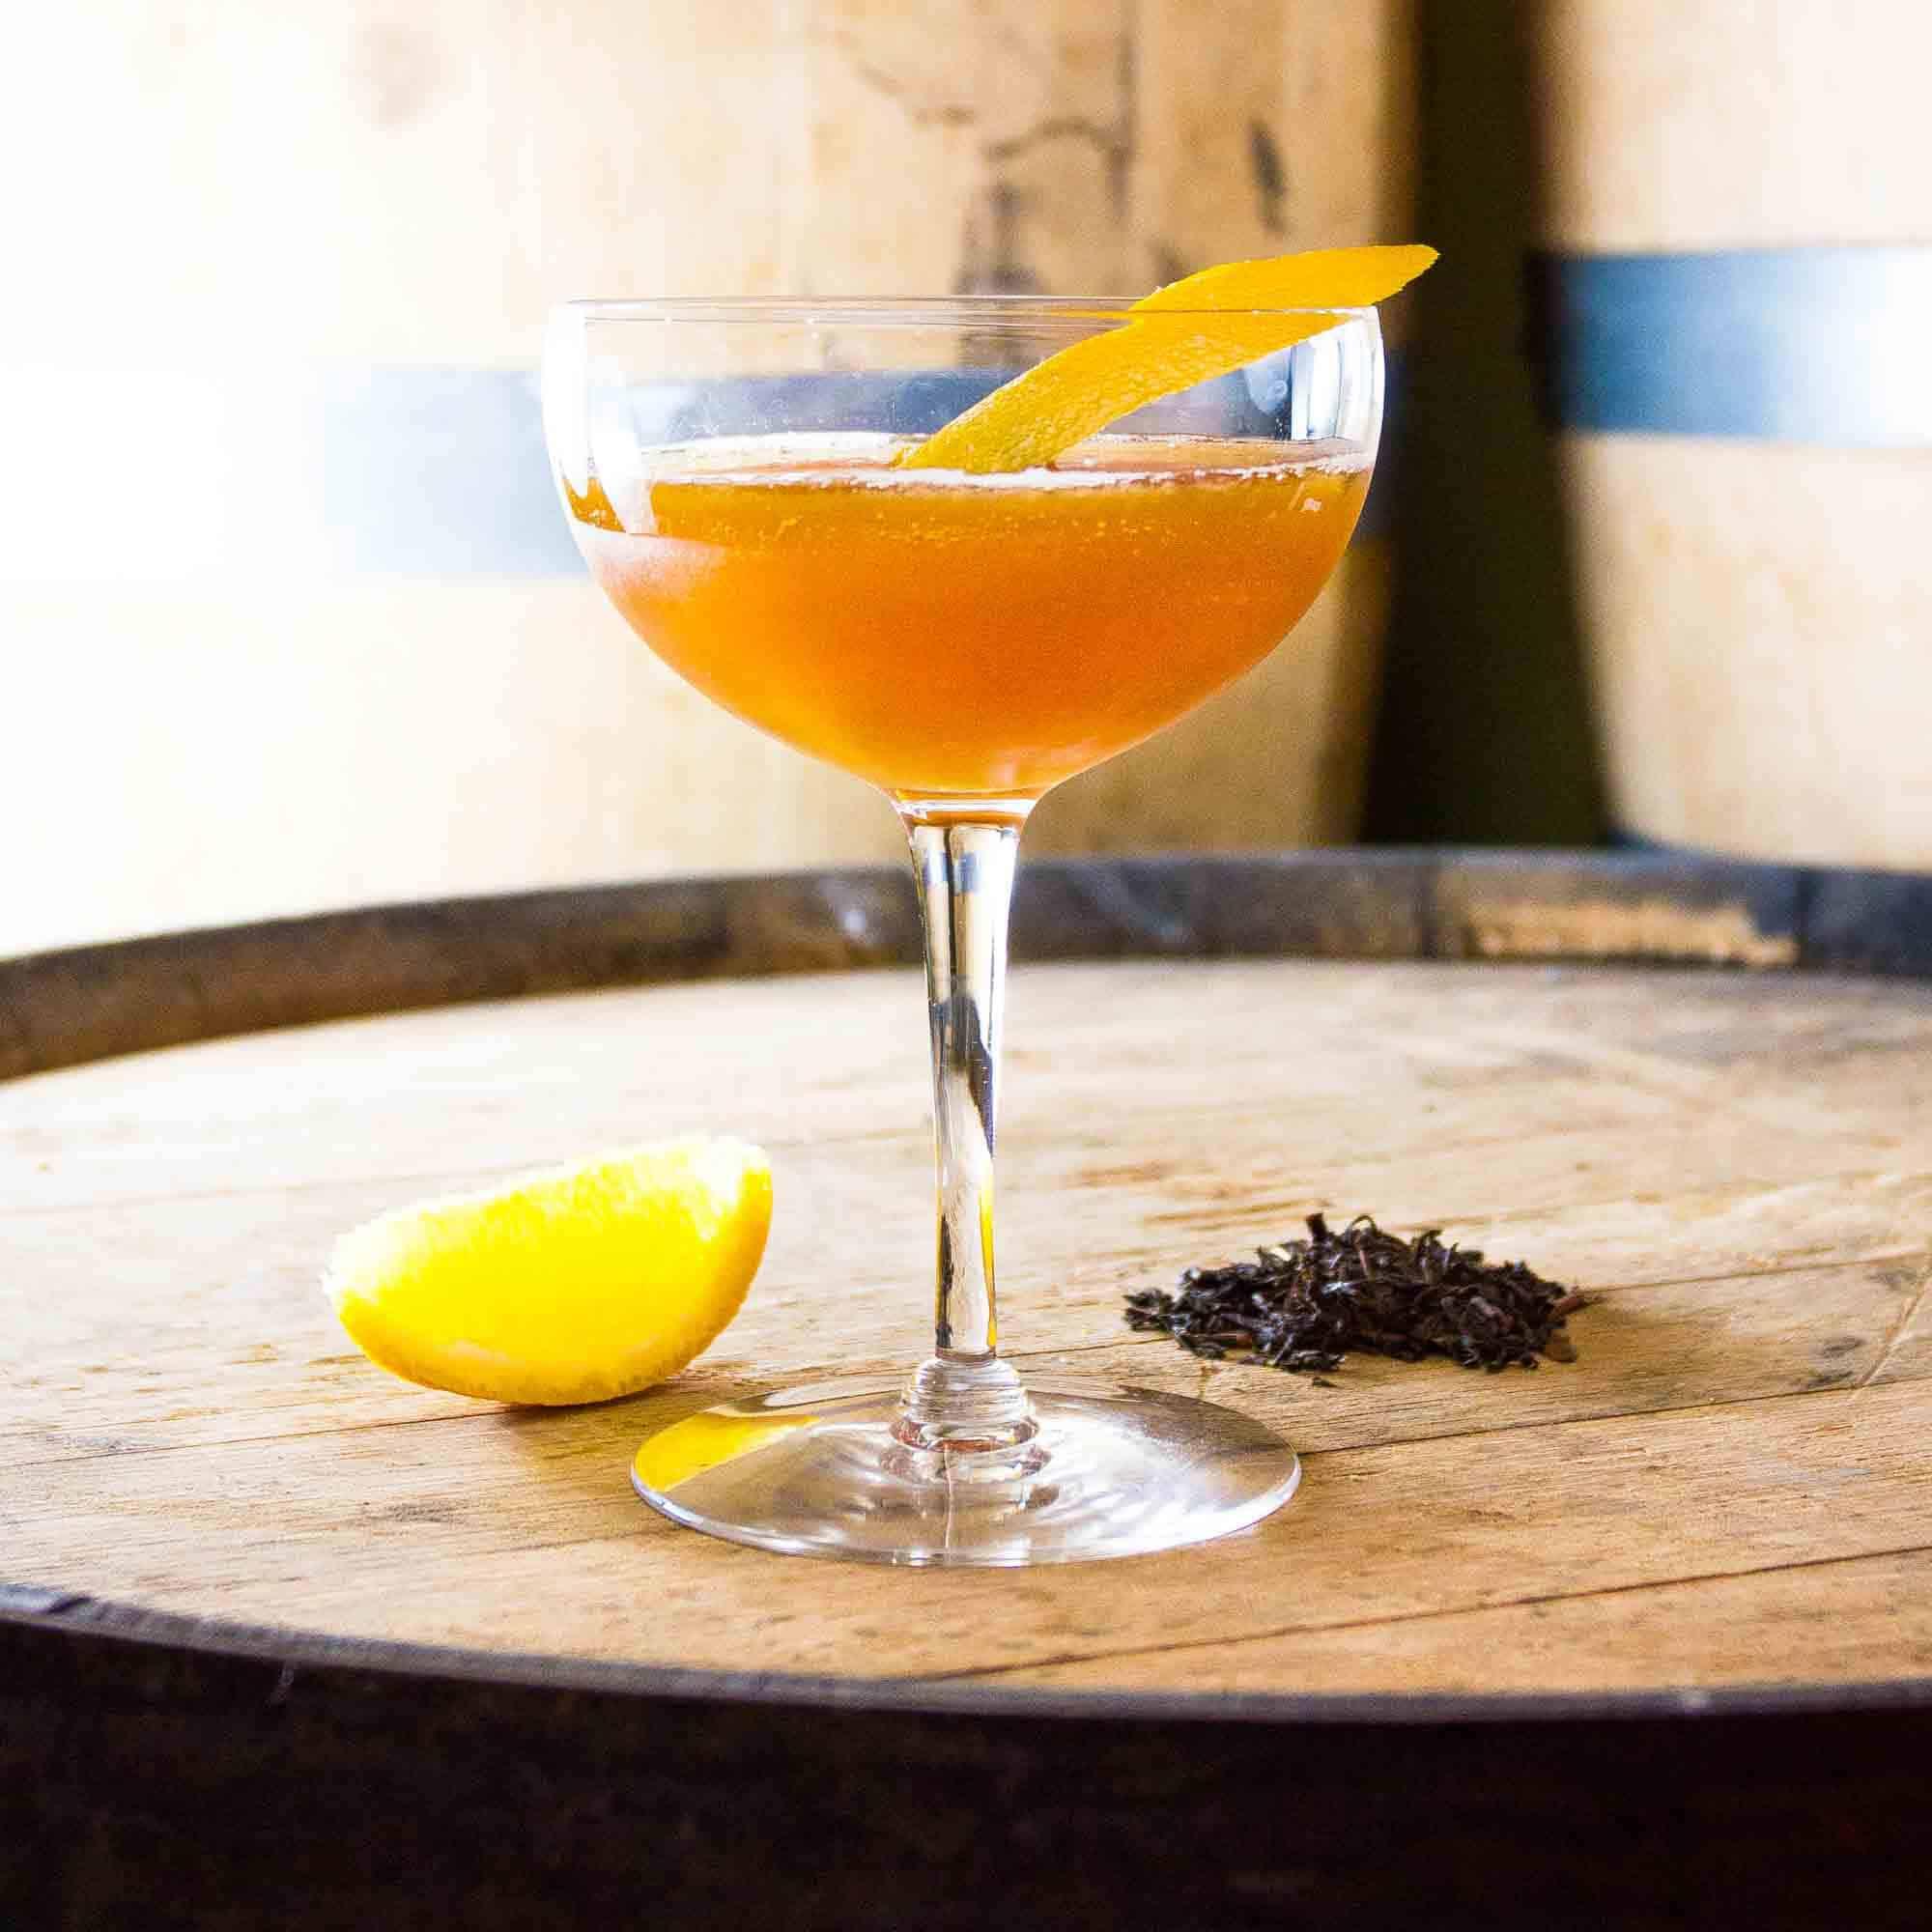 Wigle Simple Syrups and Teas